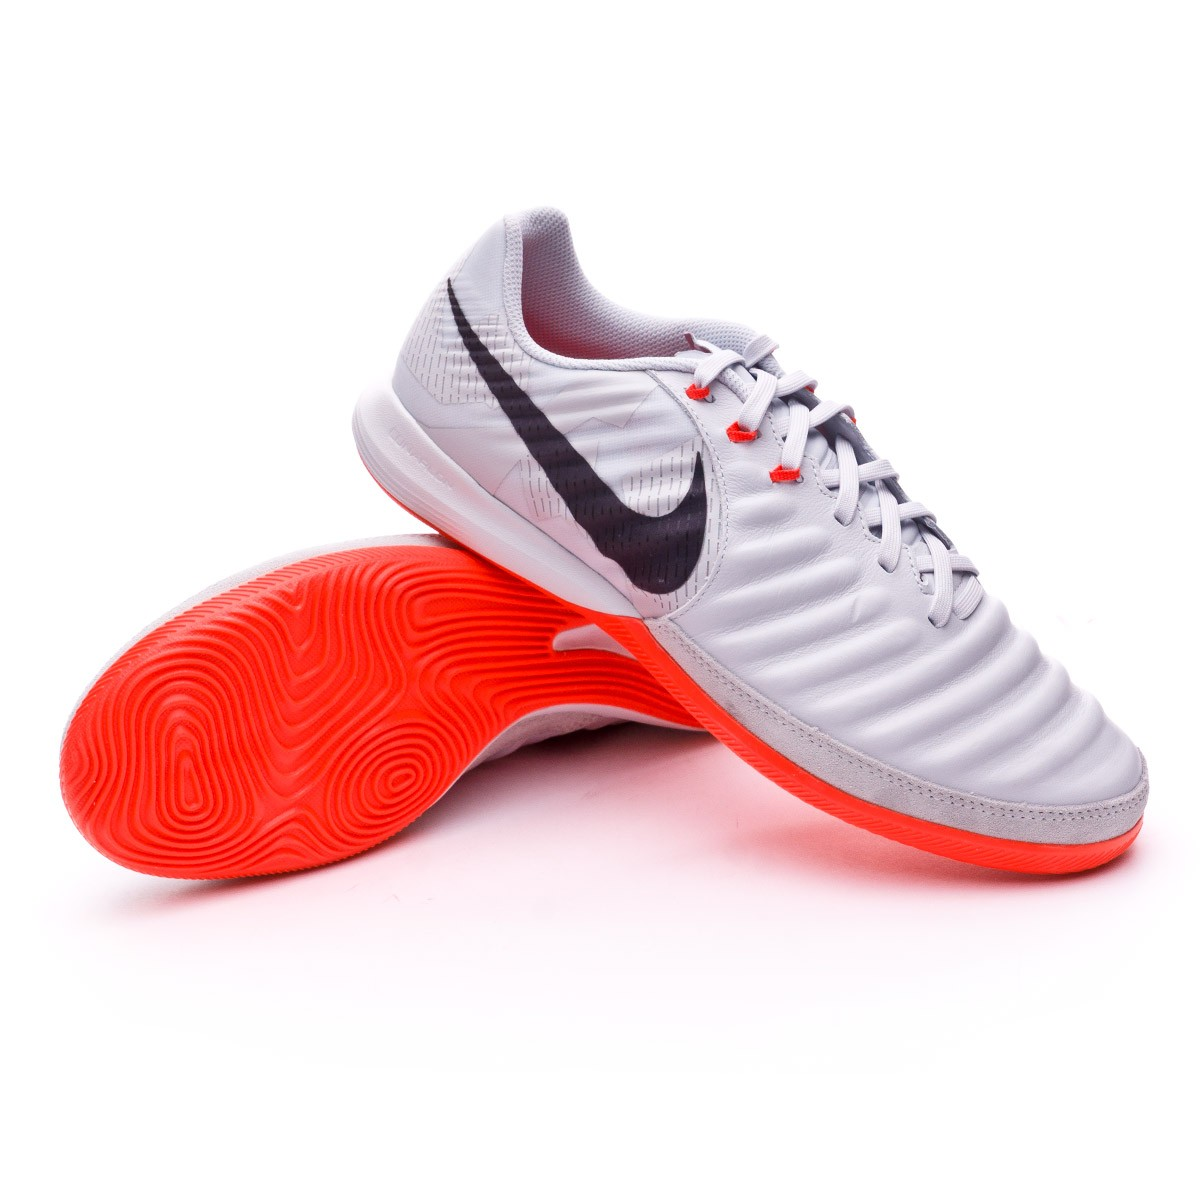 edc3538a6 Futsal Boot Nike TiempoX Finale Special Edition IC Pure  platinum-Black-Bright crimson - Football store Fútbol Emotion